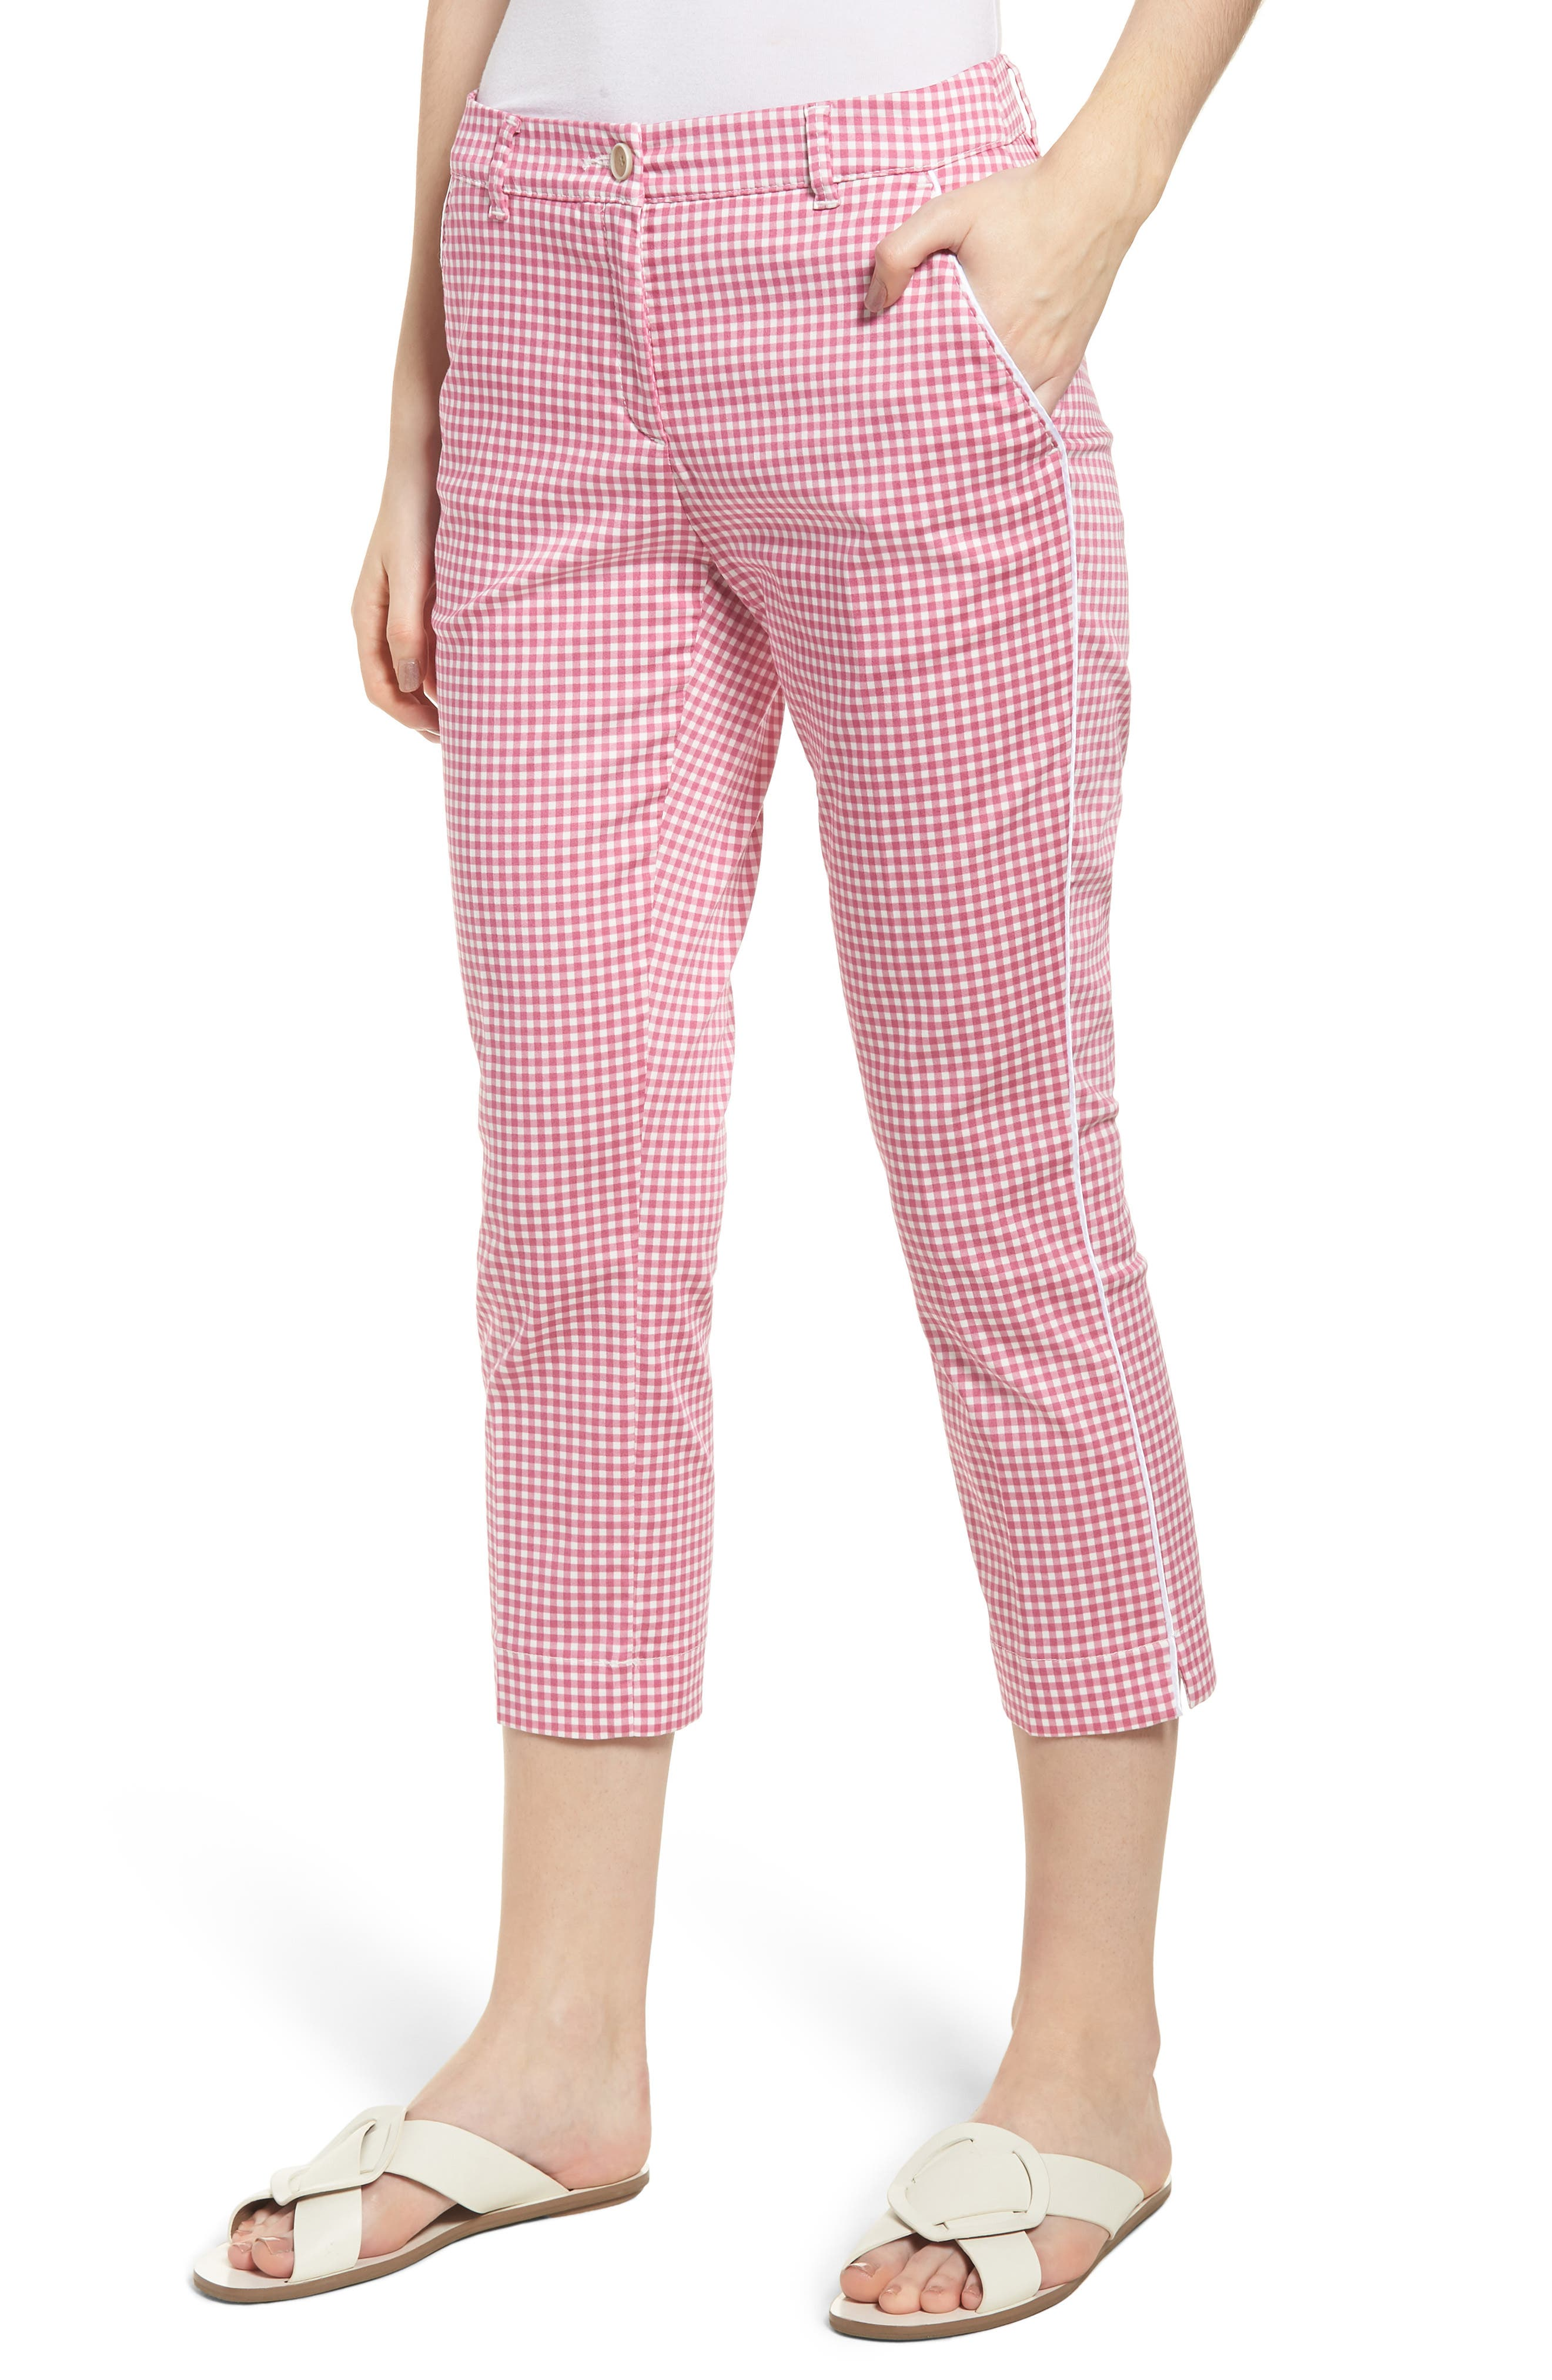 Maron Gingham Stretch Cotton Pants,                             Main thumbnail 1, color,